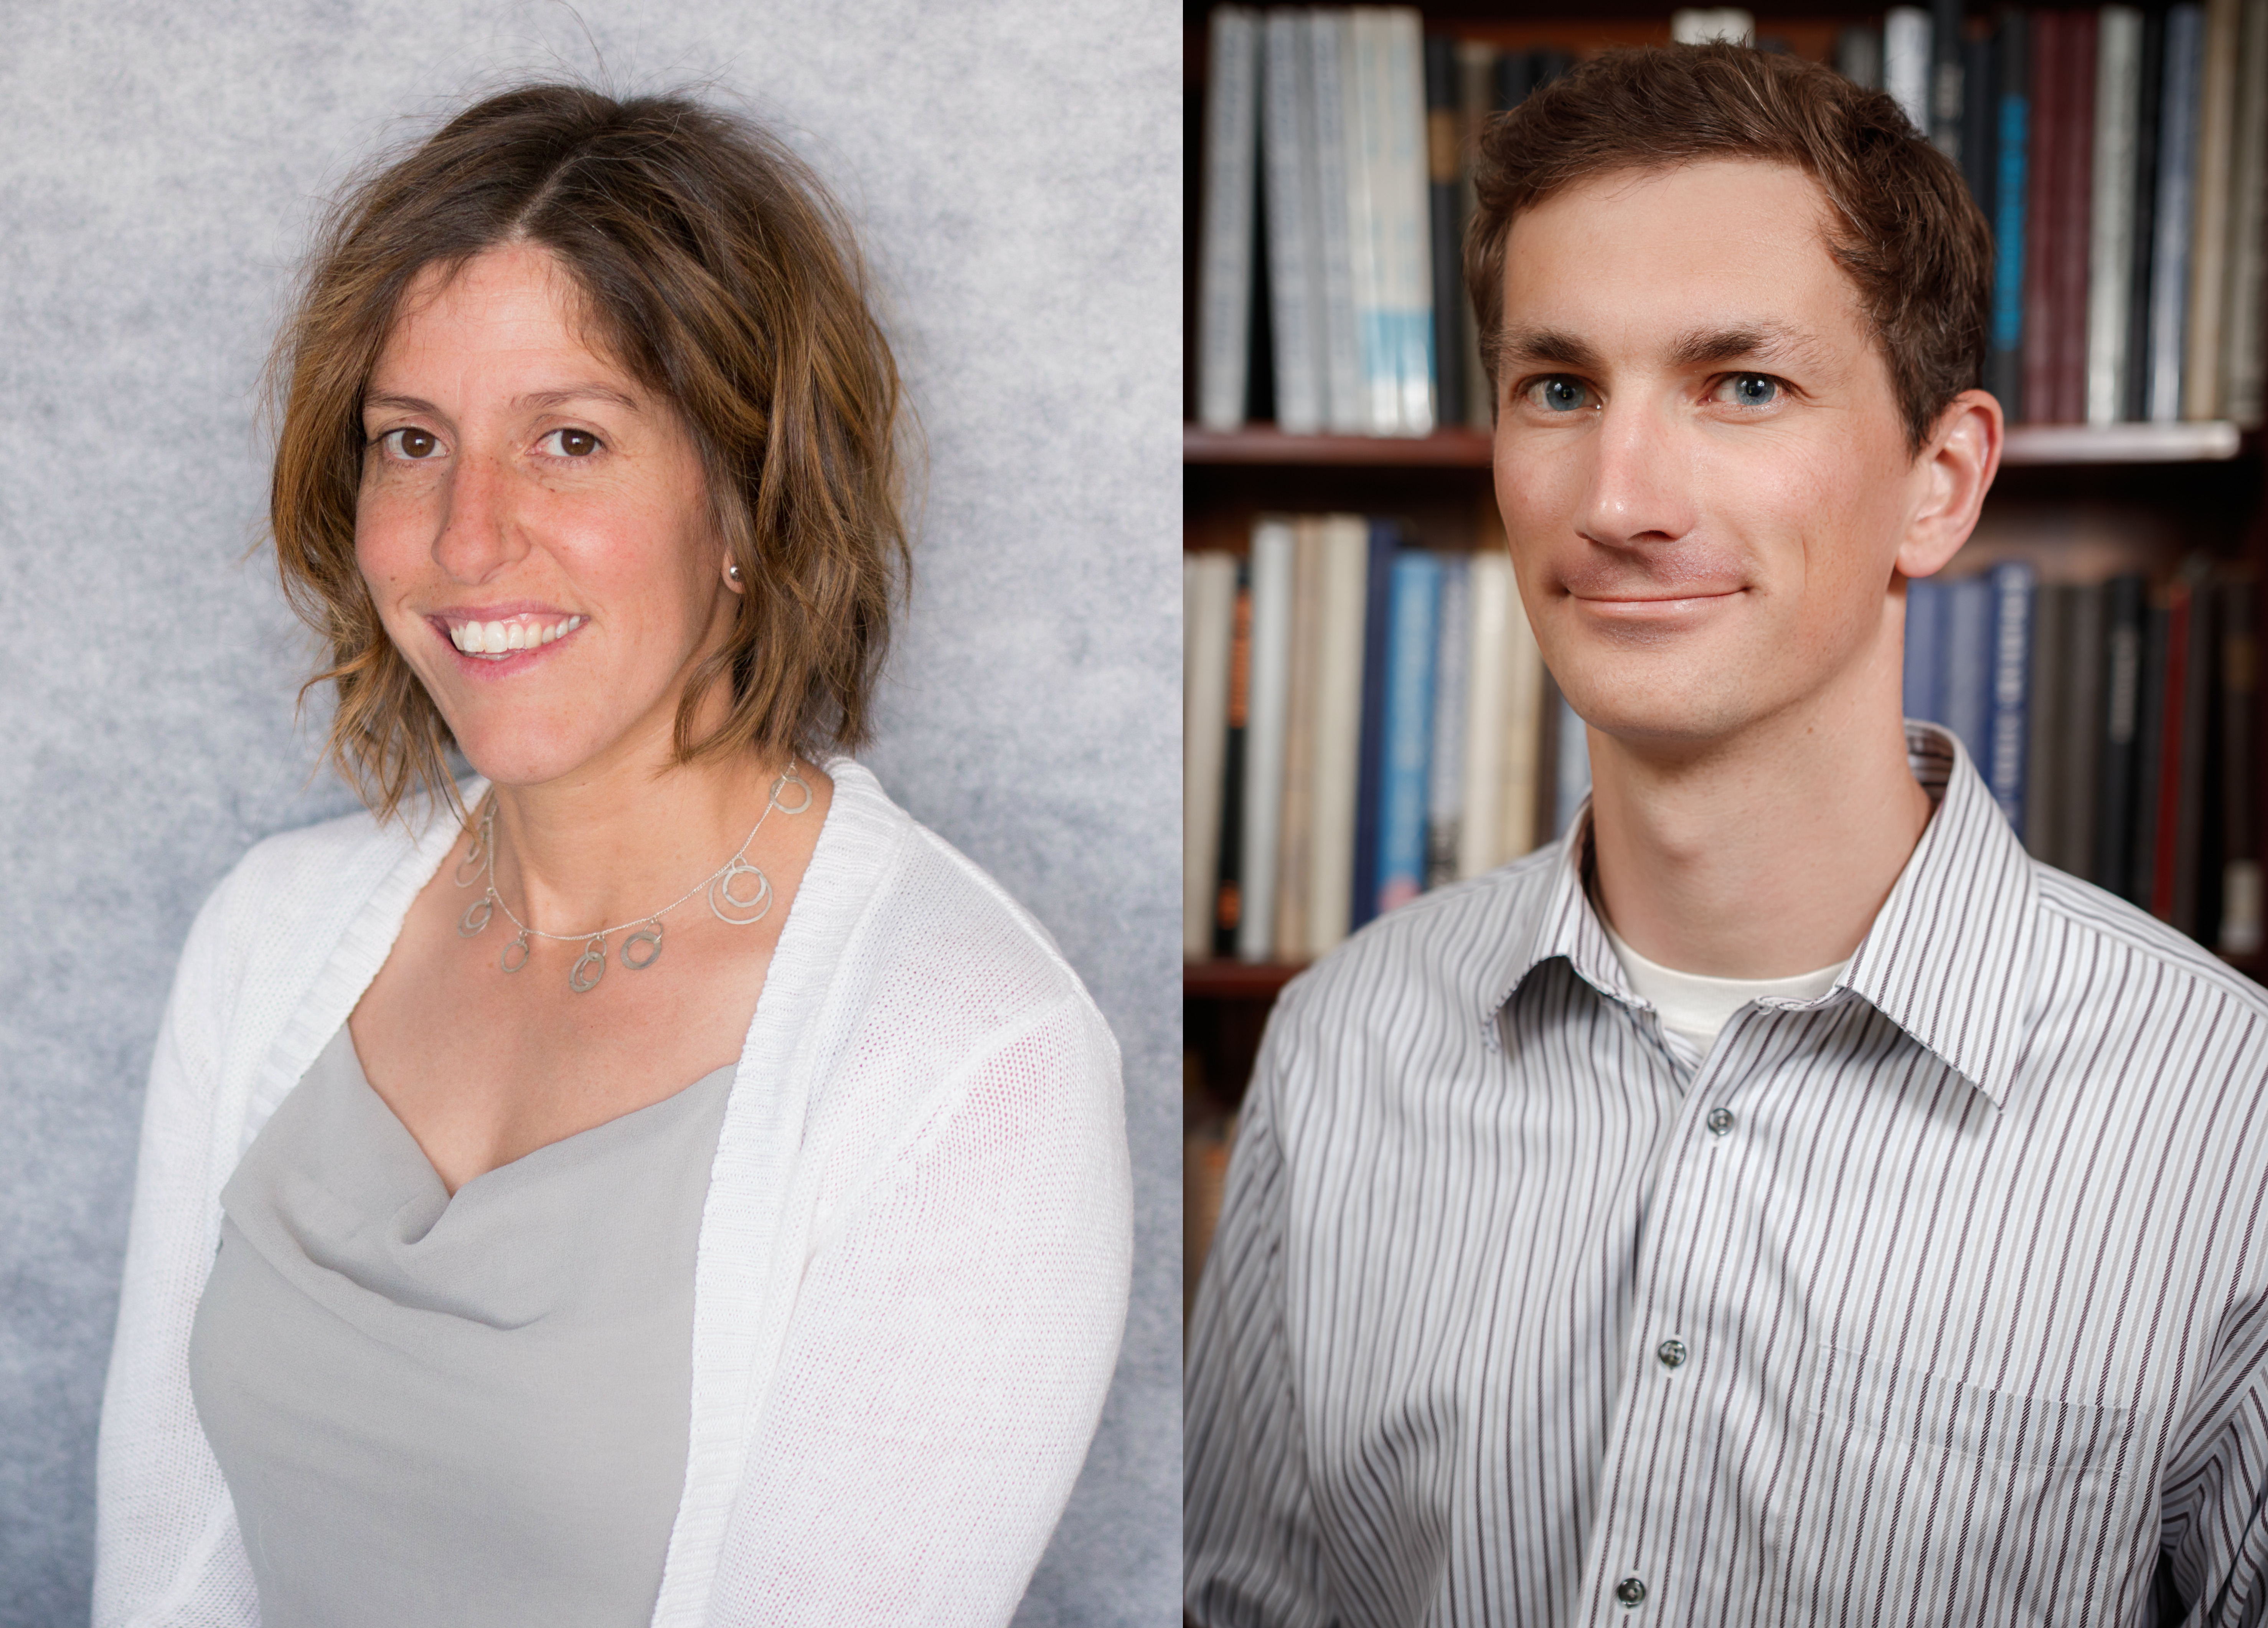 Colorado School of Mines professors Kamini Singha and Eric Toberer